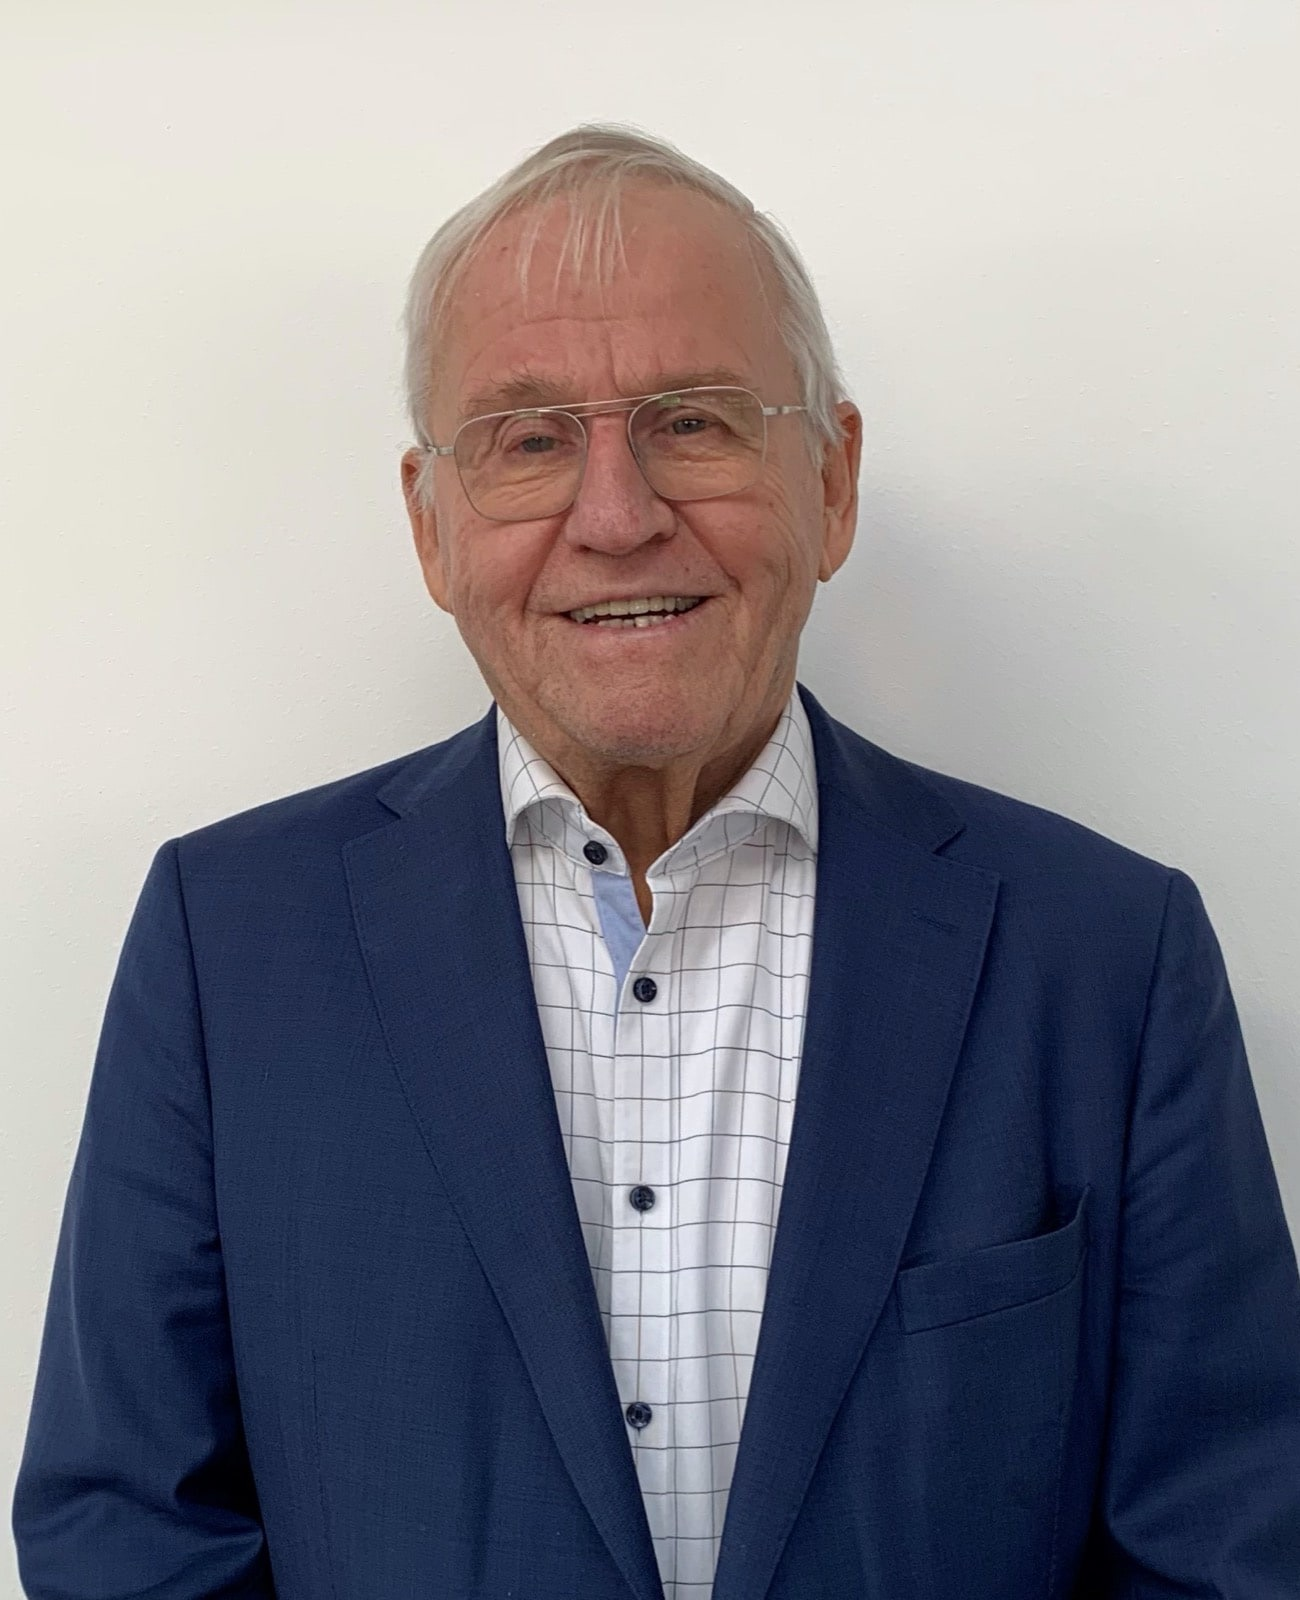 Bertil Hammarstedt